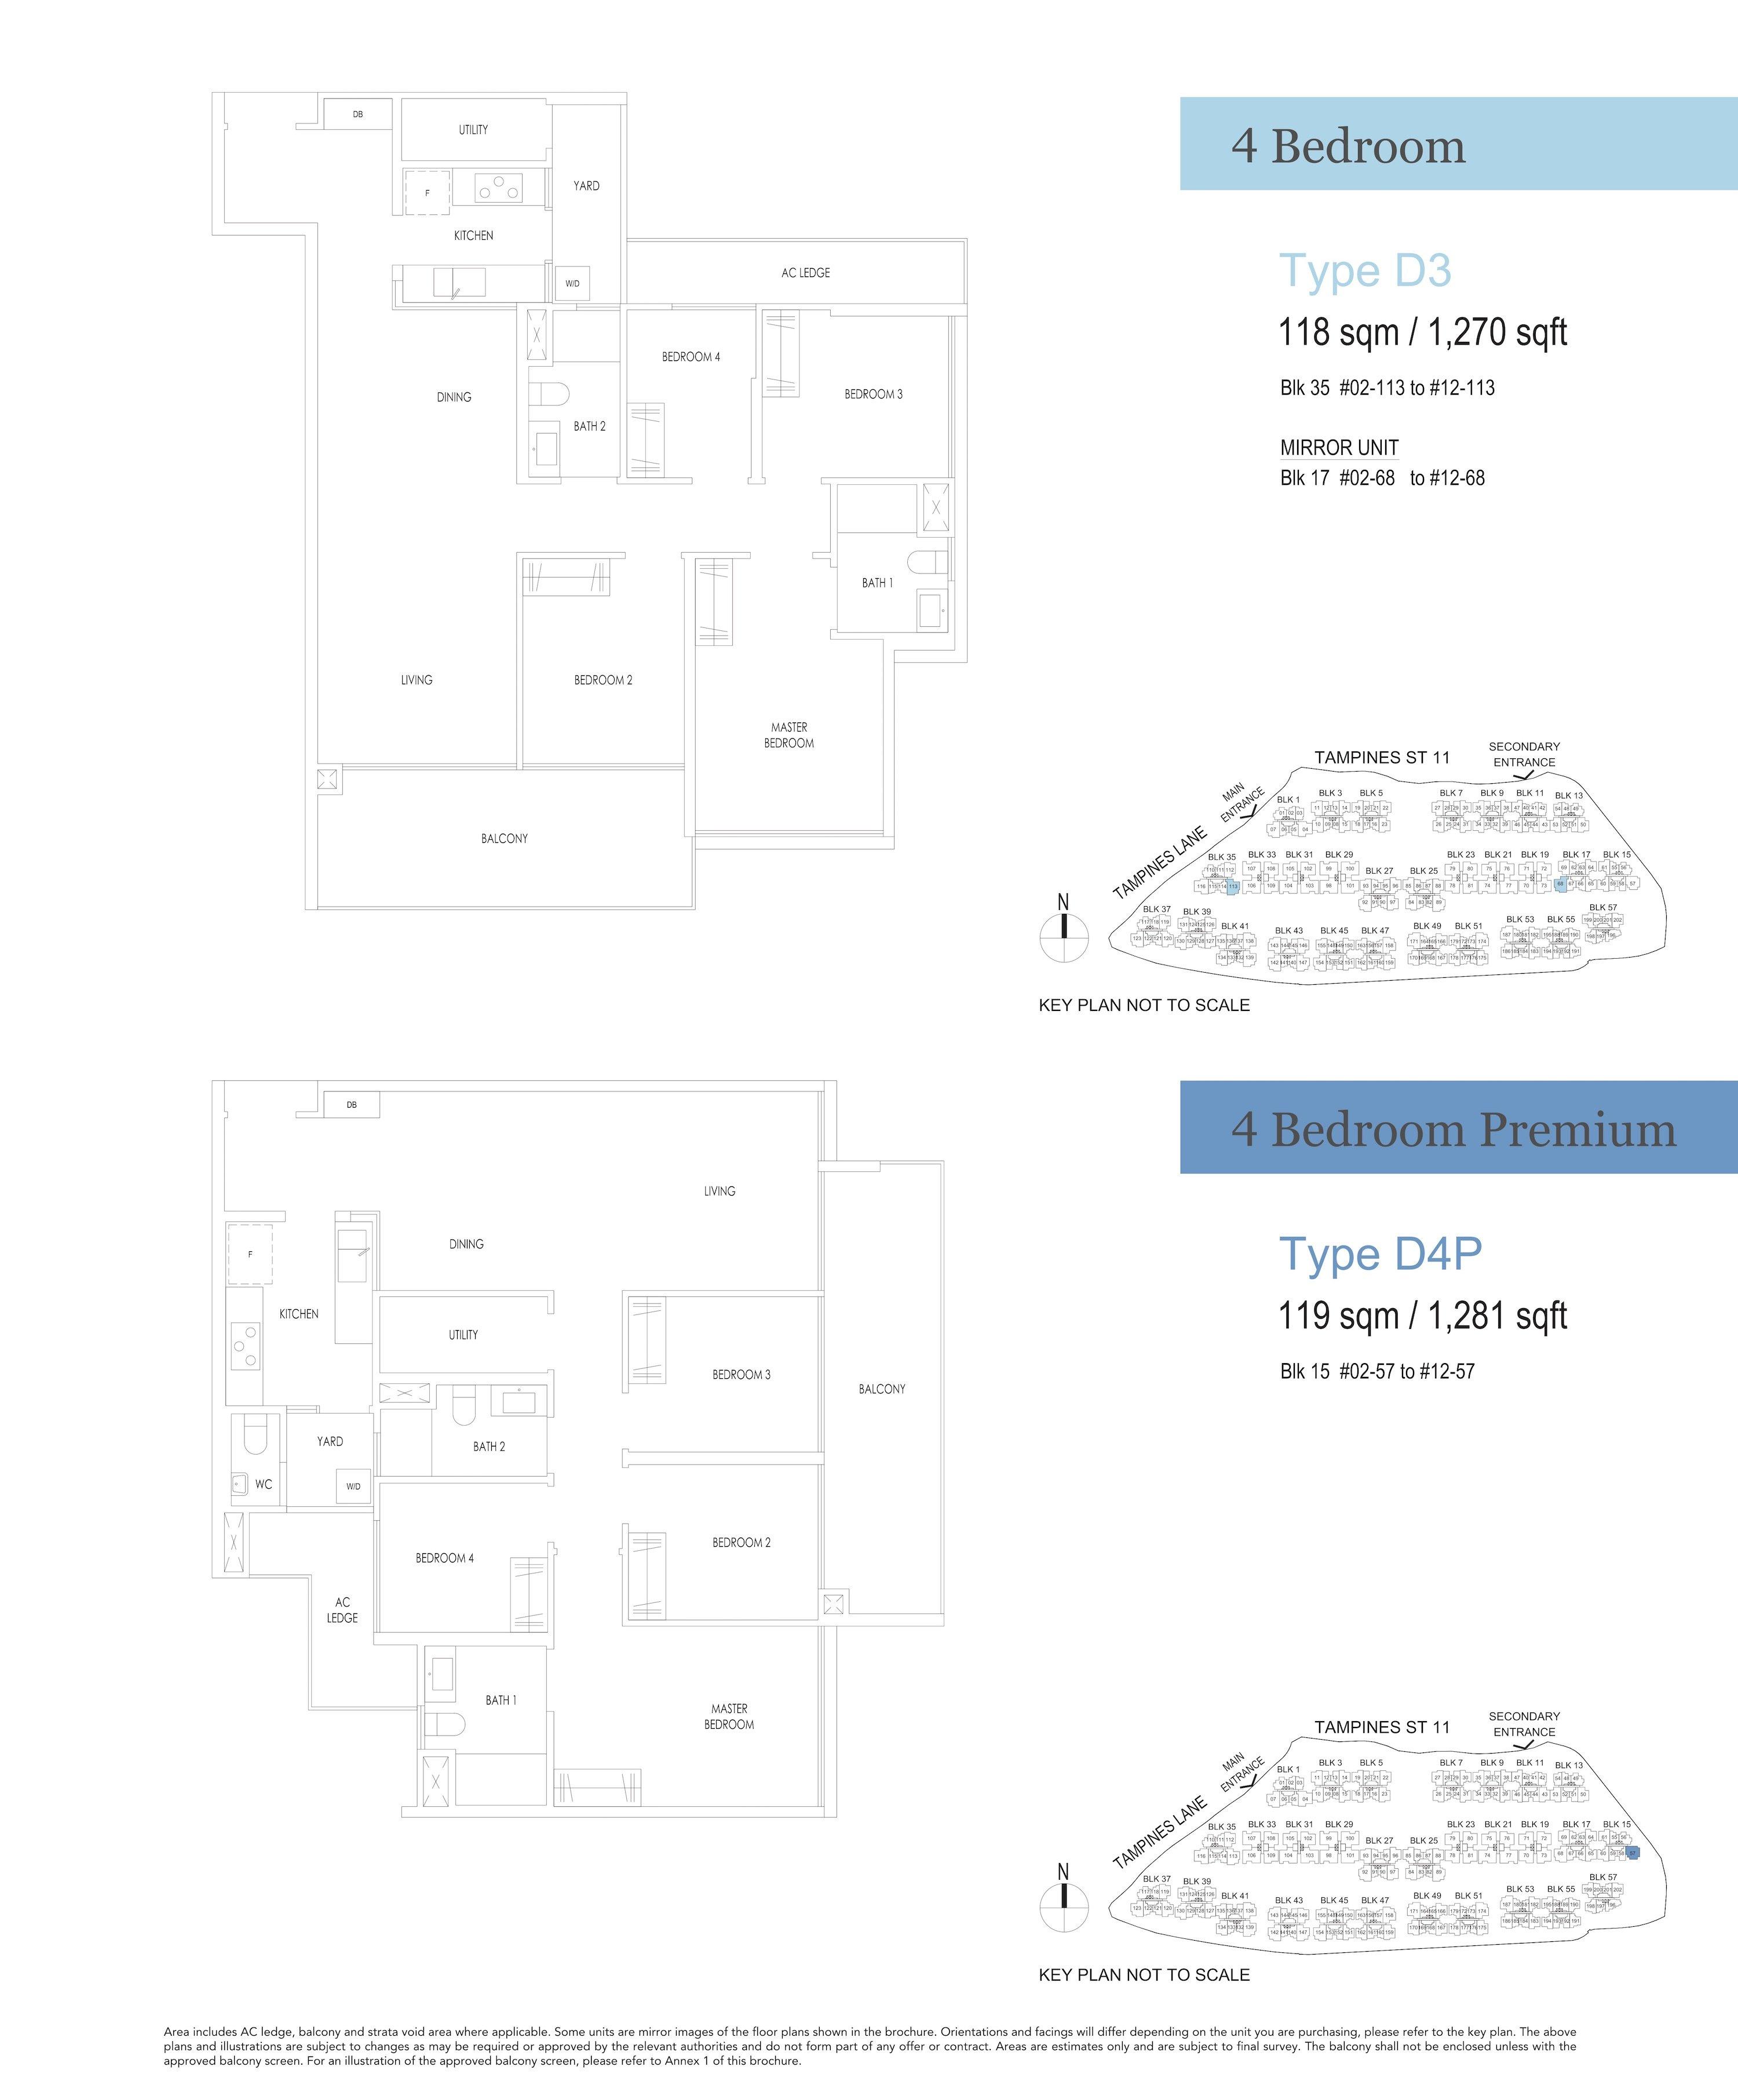 Treasure At Tampines 聚宝园 4-bedroom 4卧房 D3 D4P